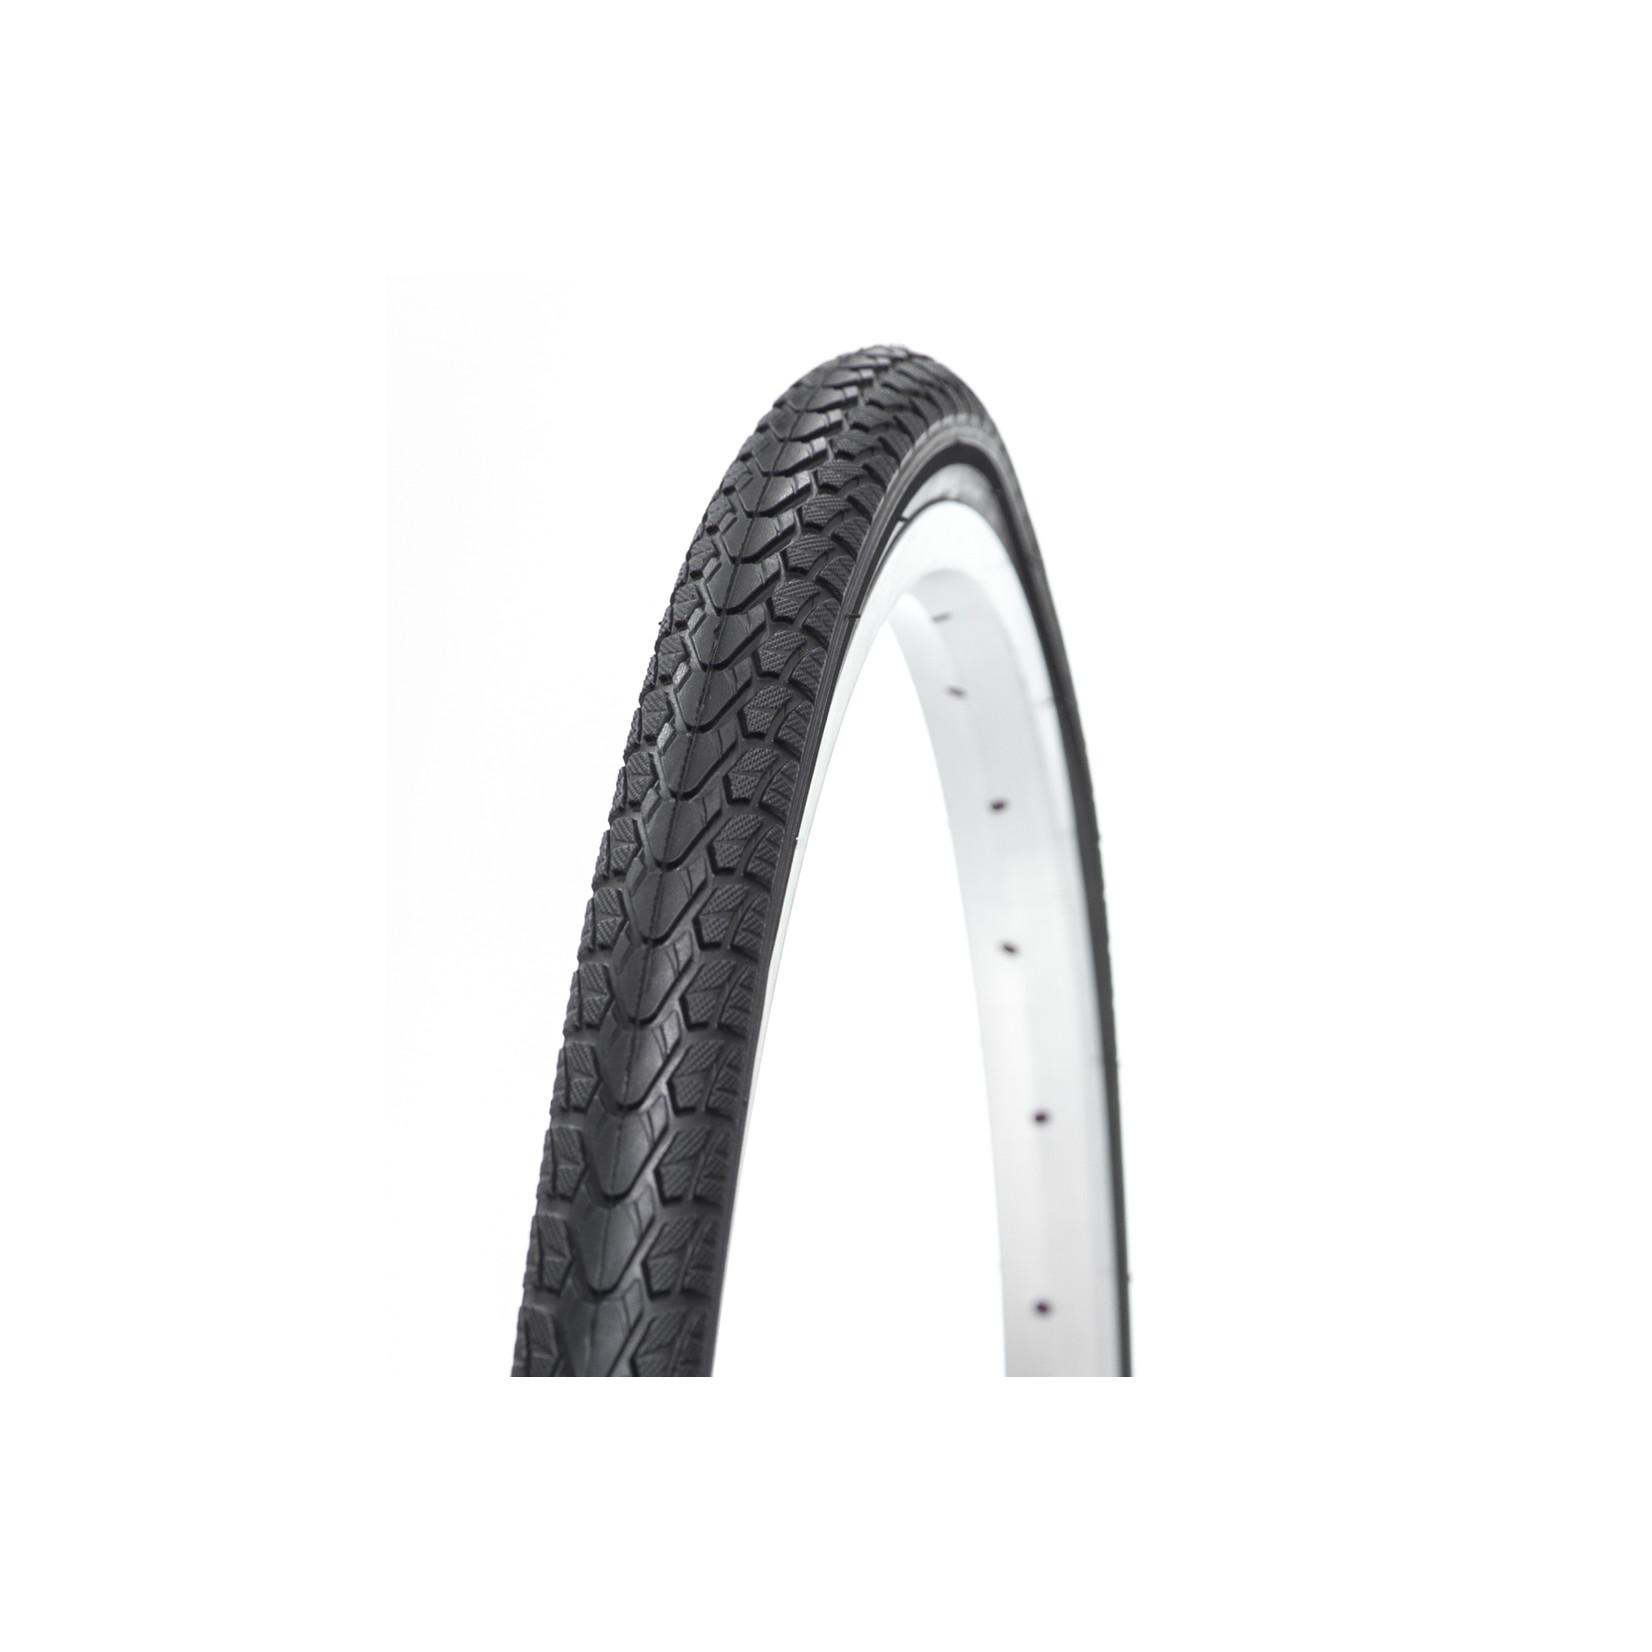 700 x 35c (37-622) Hybrid Tyre - Black